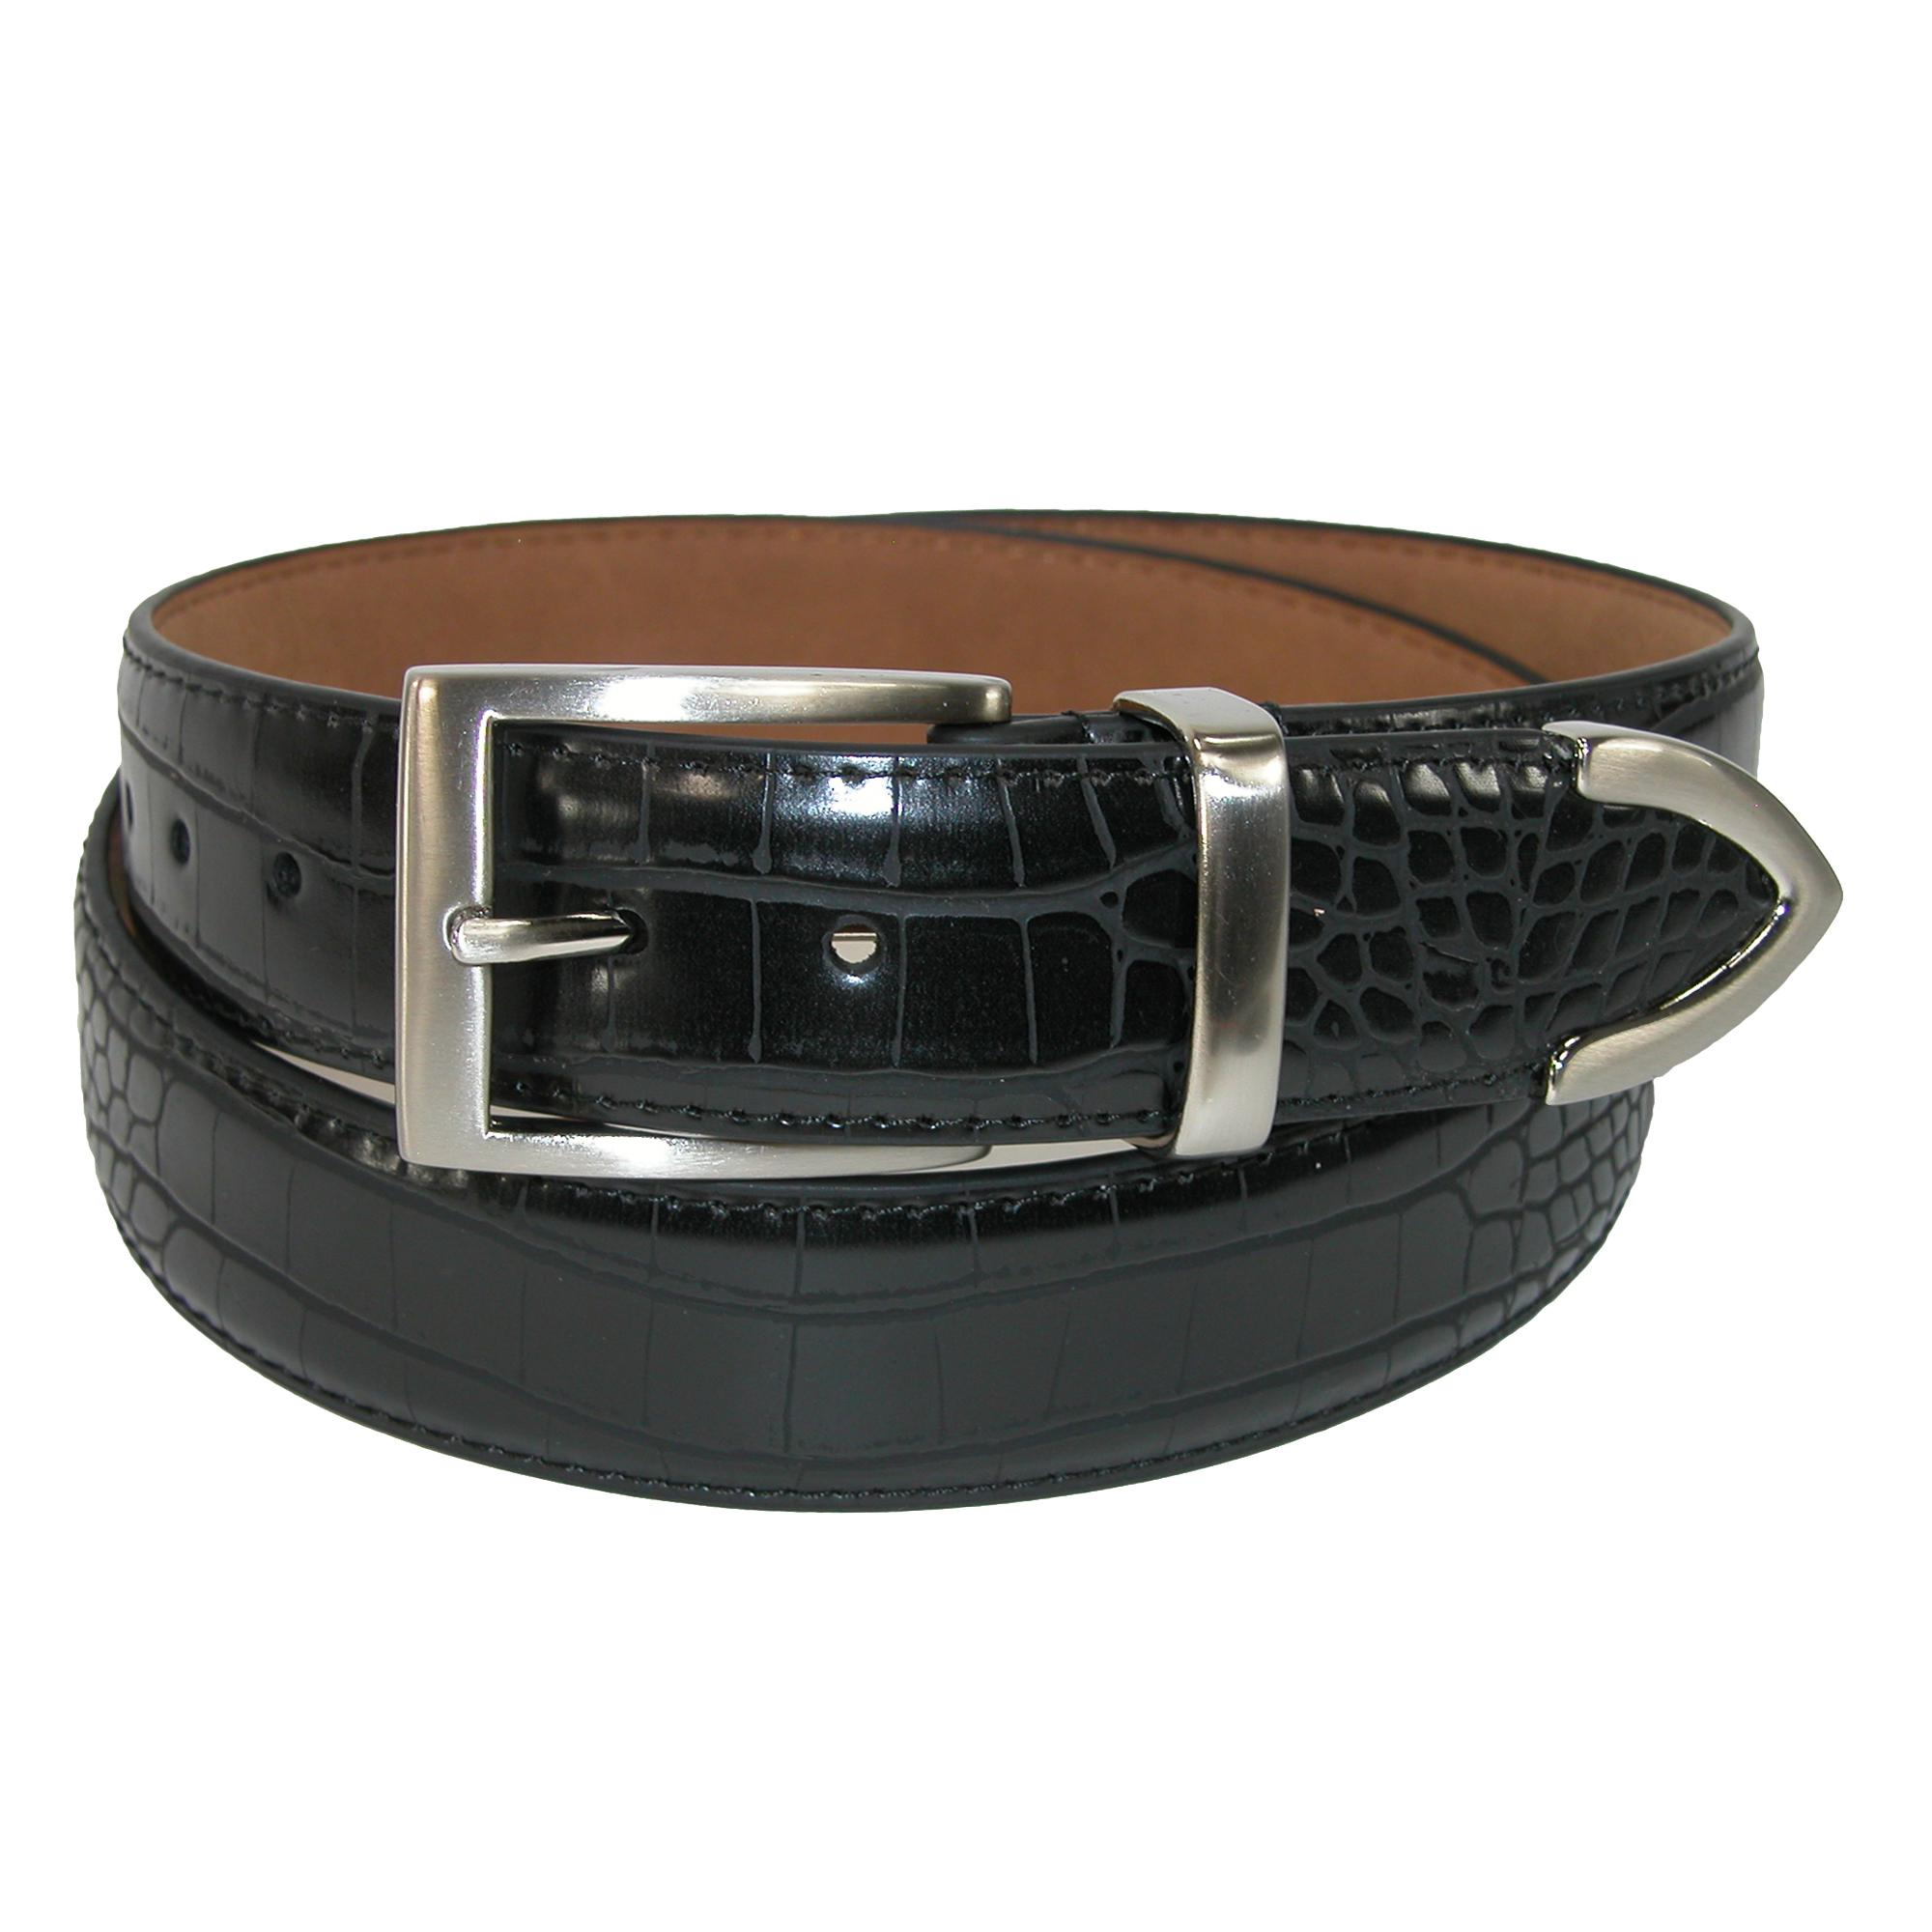 Pga Mens Croco Print 3 Piece Leather Belt